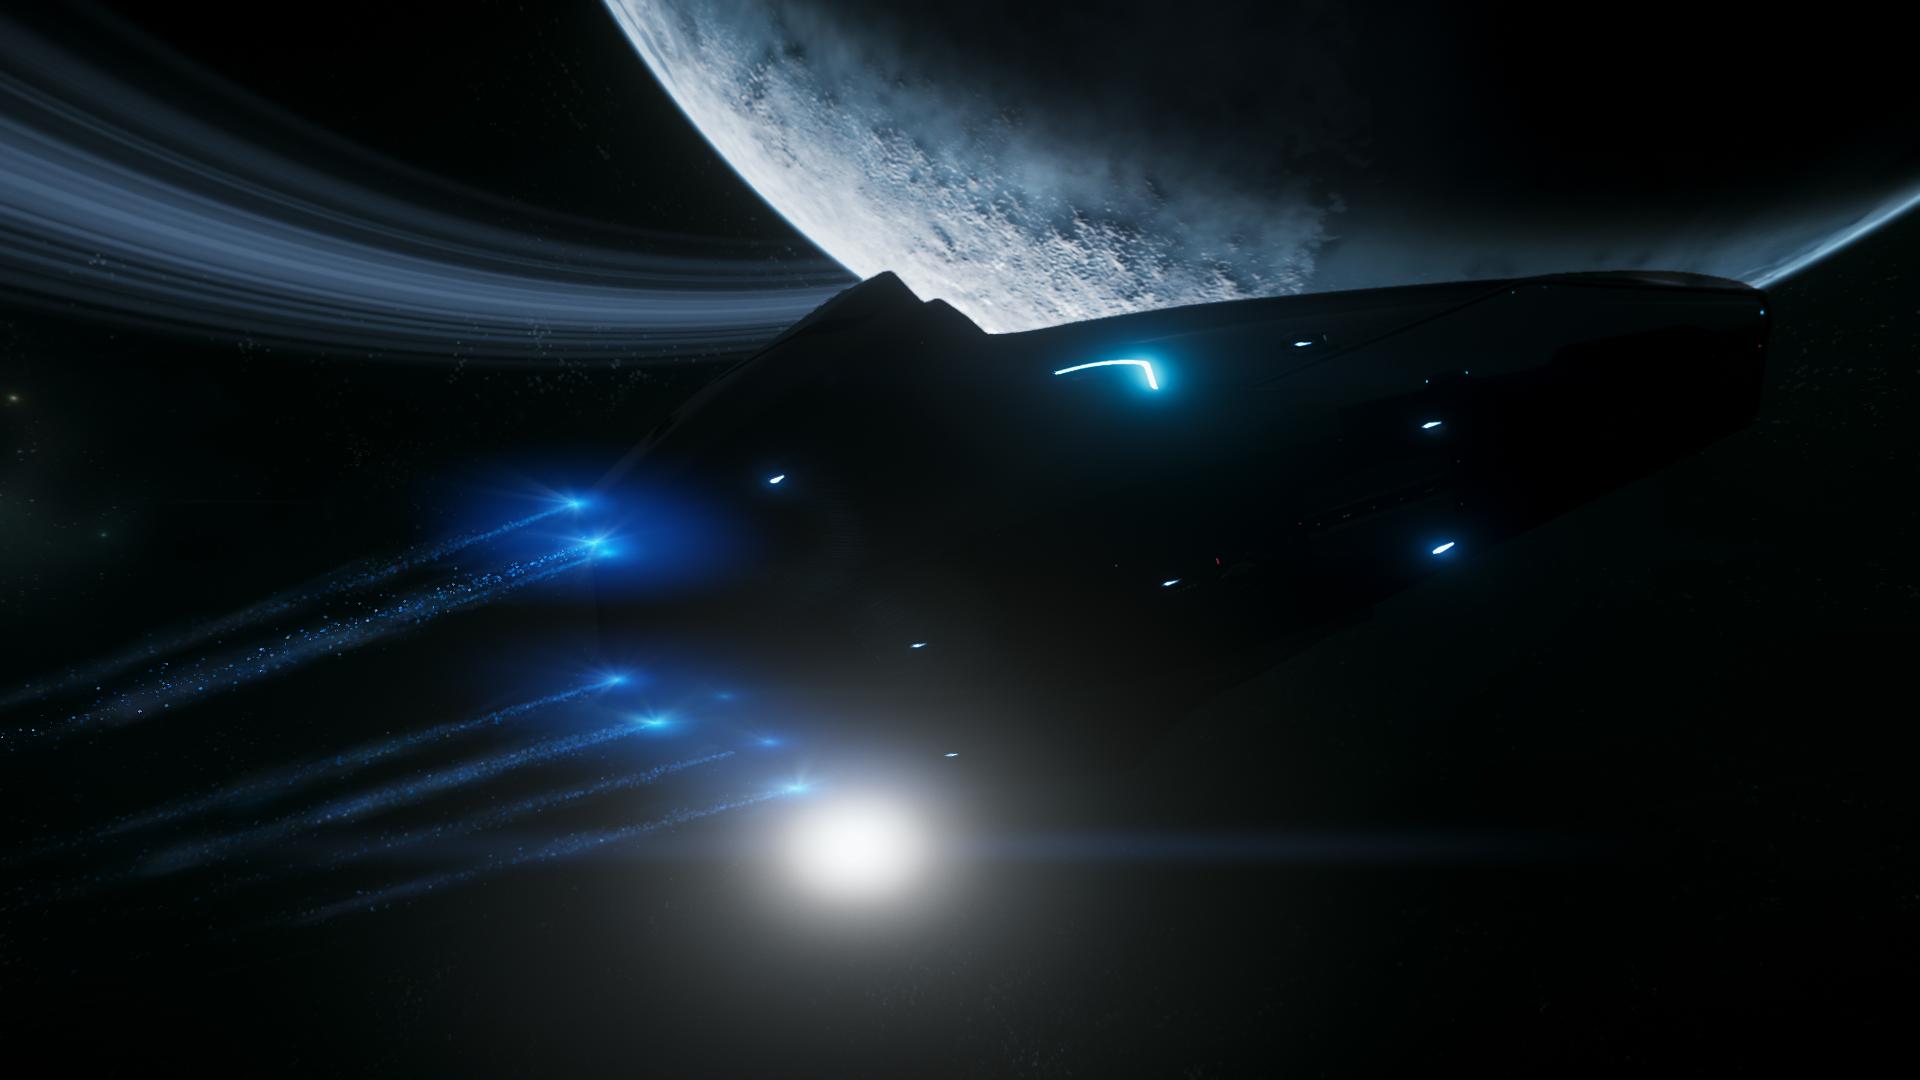 Squadron 42 - Star Citizen Screenshot 2018.08.06 - 19.27.33.21.png